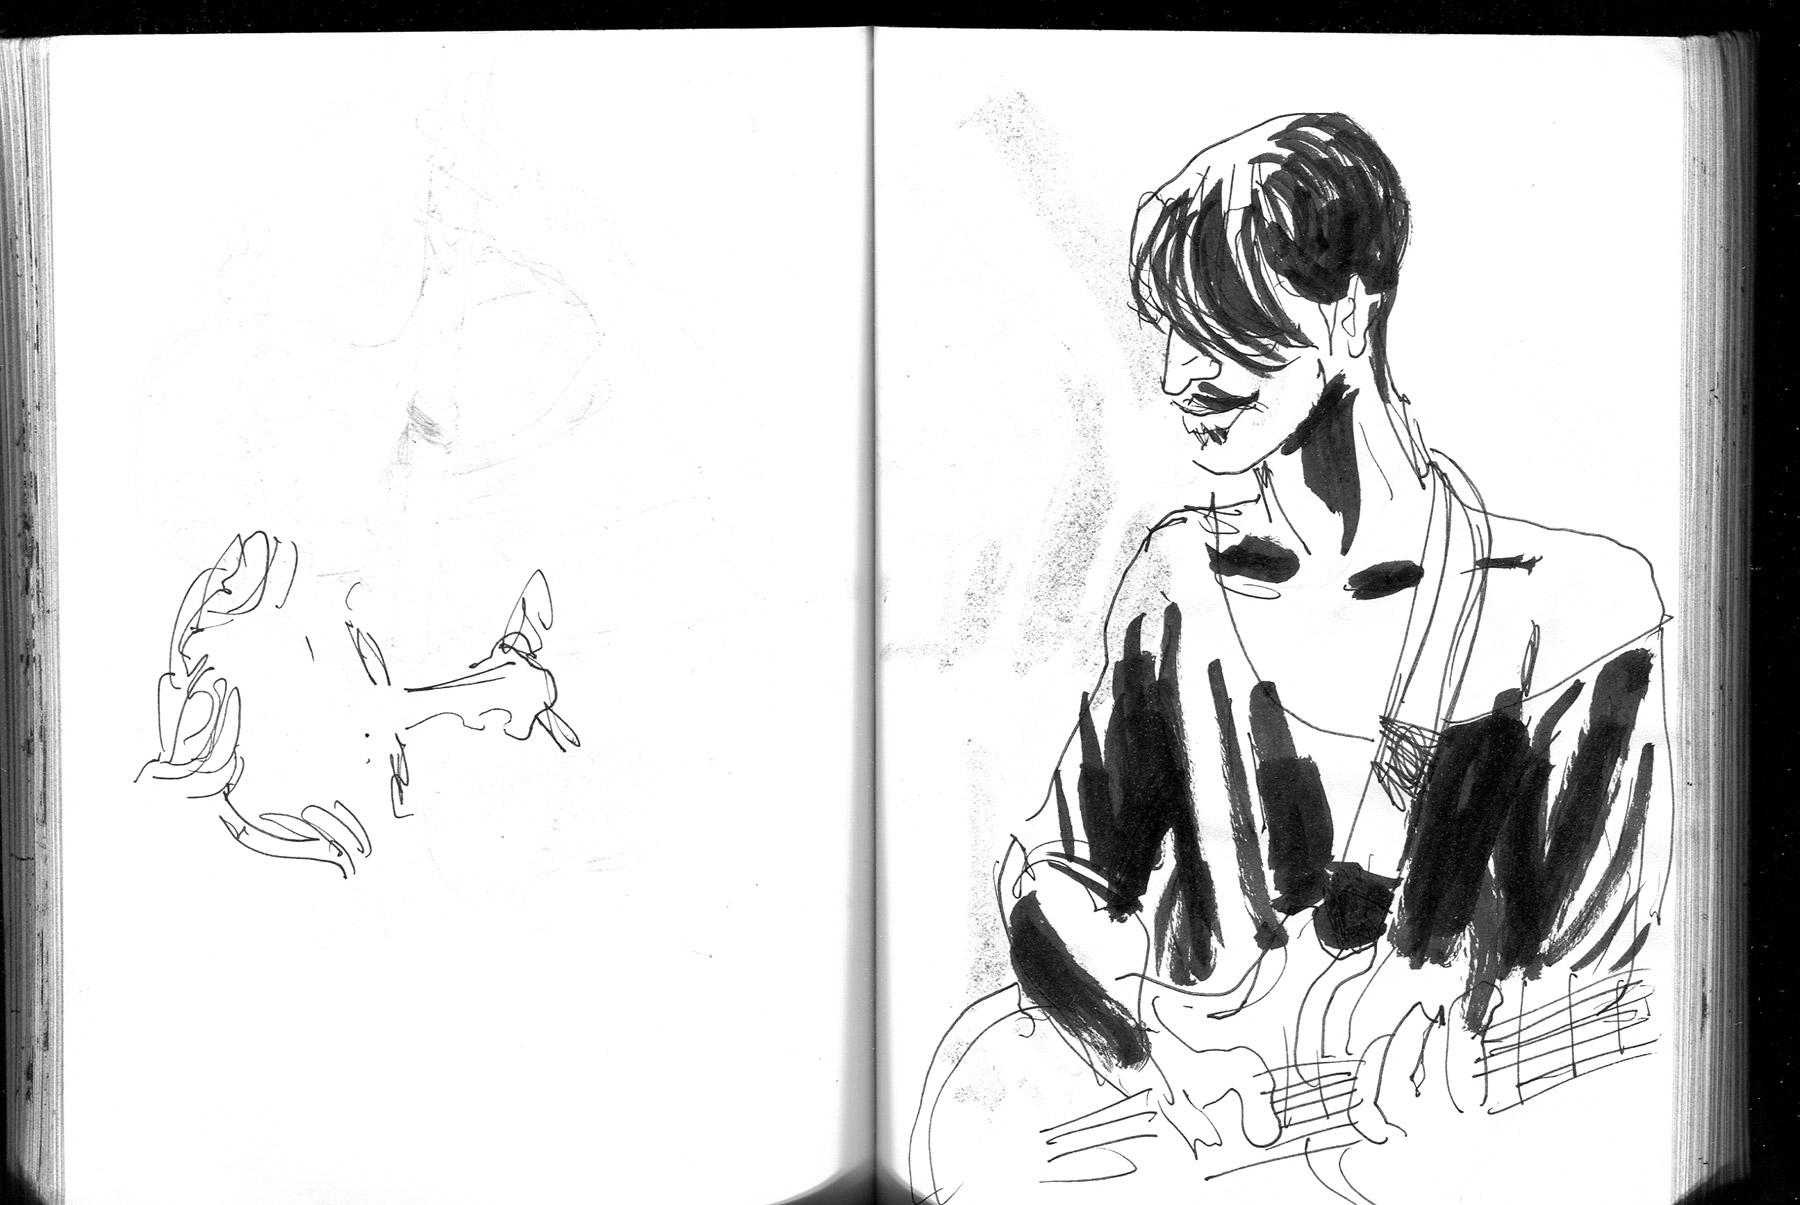 davidm_sketches_2014_08-093.jpg